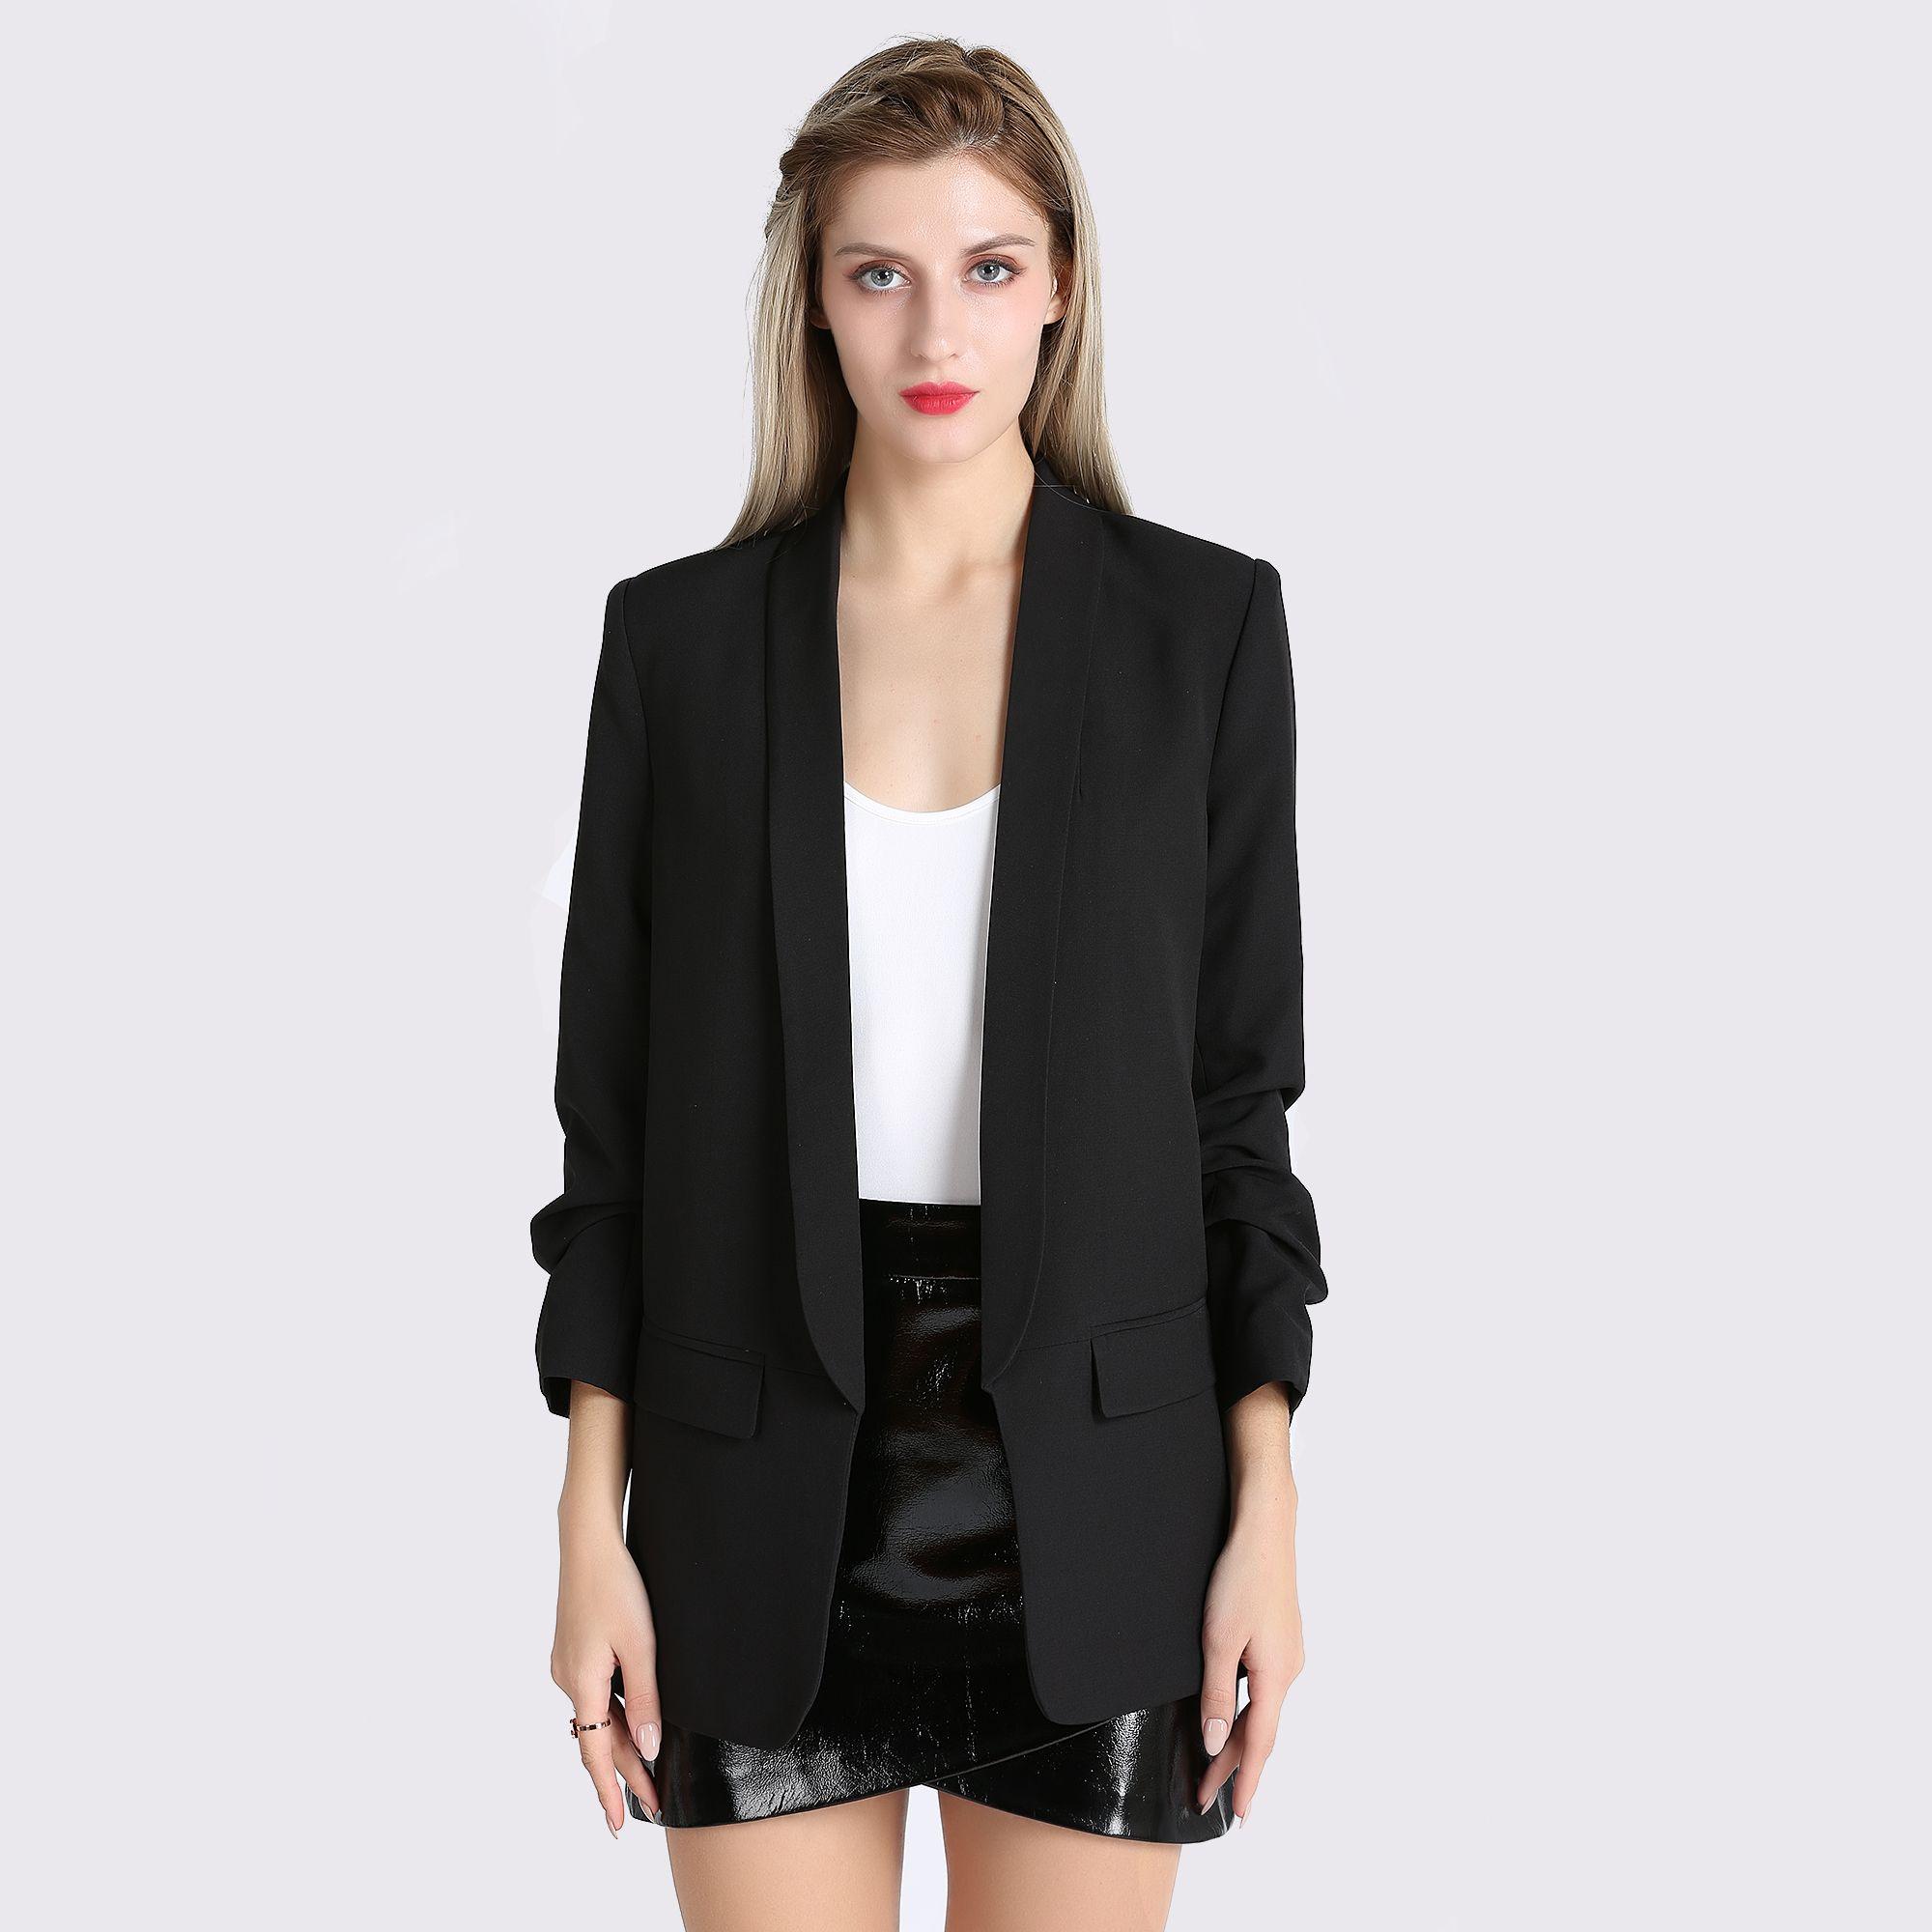 f1af1666fdad5 Fashion Autumn Women Blazers and Jackets Work Office Lady Suit Slim White  Black None Button Business female blazer Coat Zevrez  Women  Beauty   Fashion ...